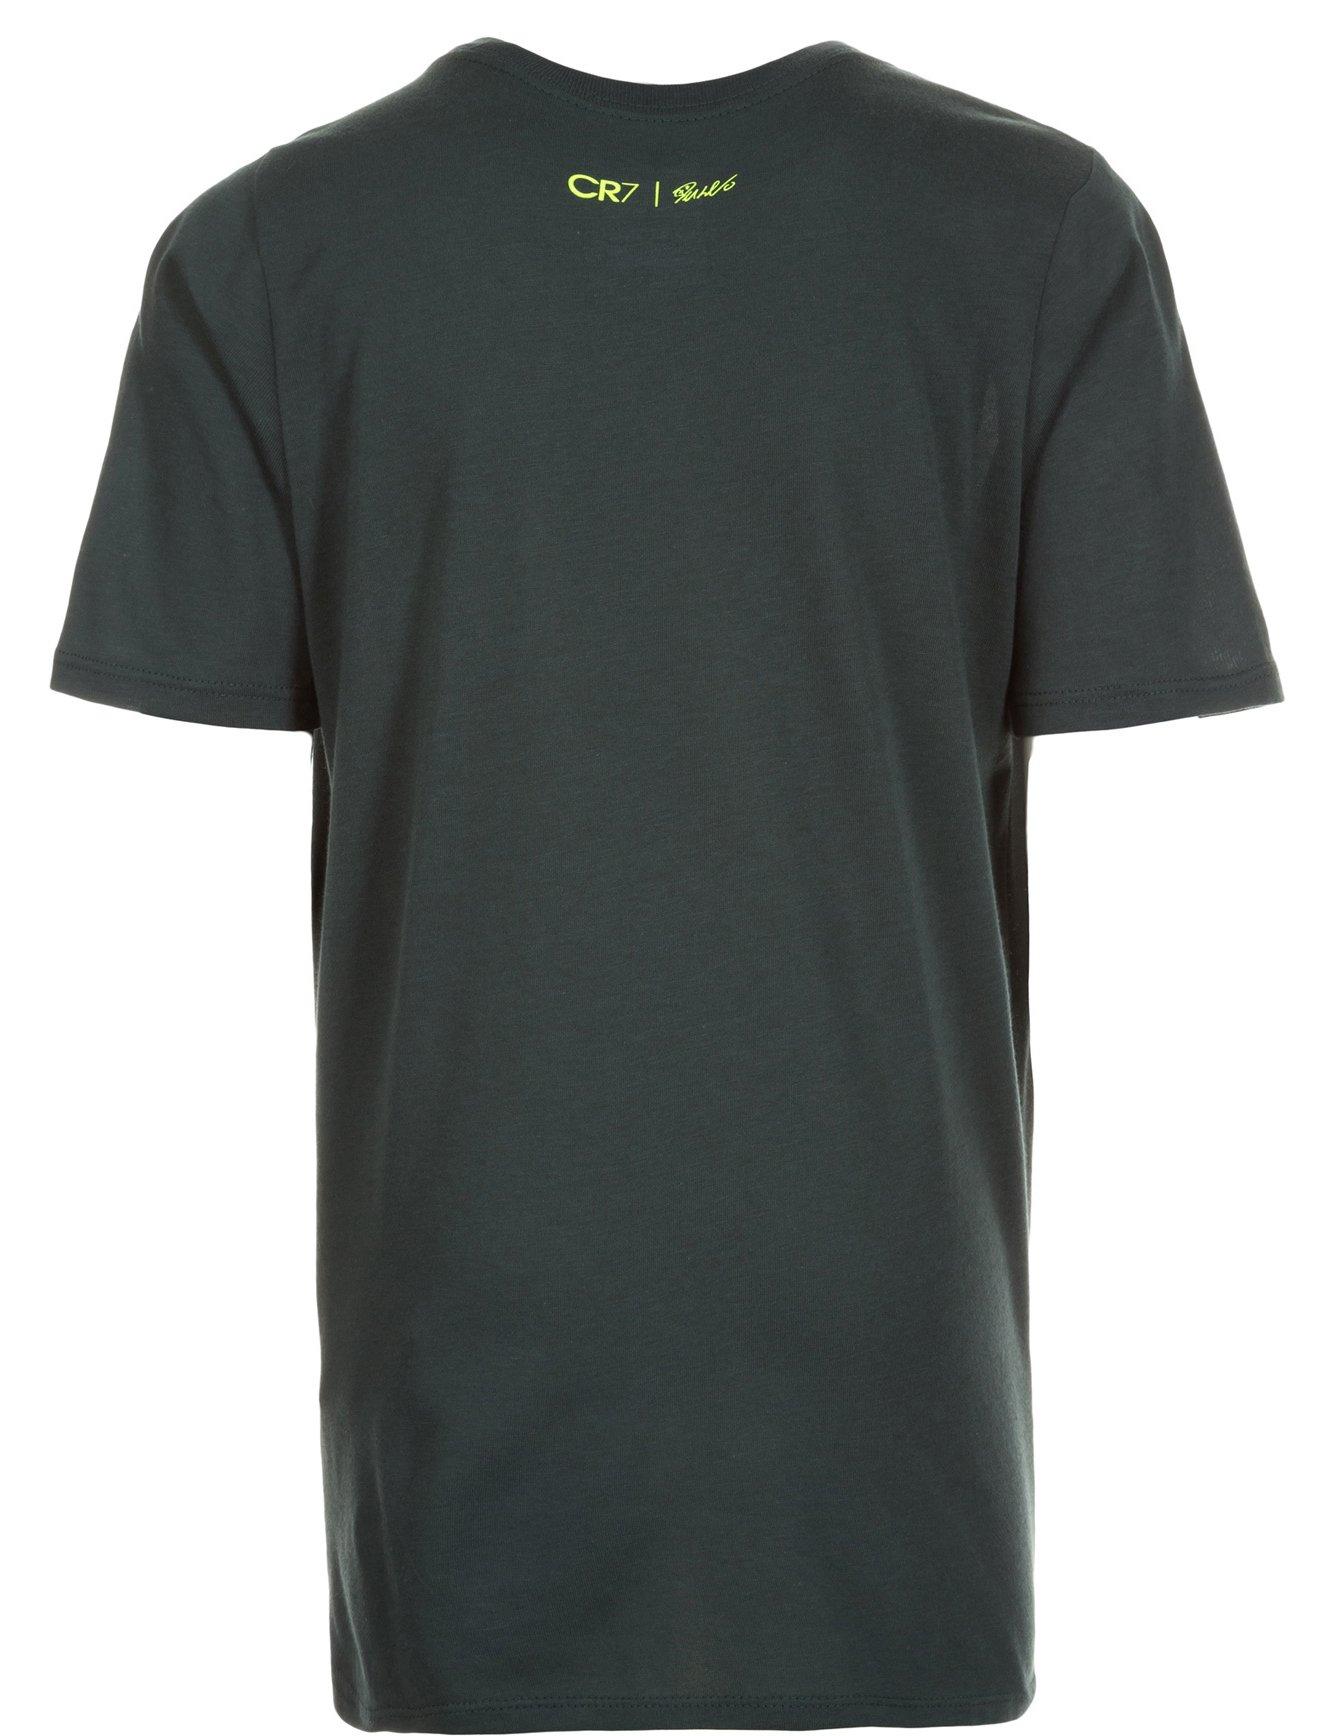 Tri ko nike ronaldo b nk logo tee for Company logo shirts no minimum